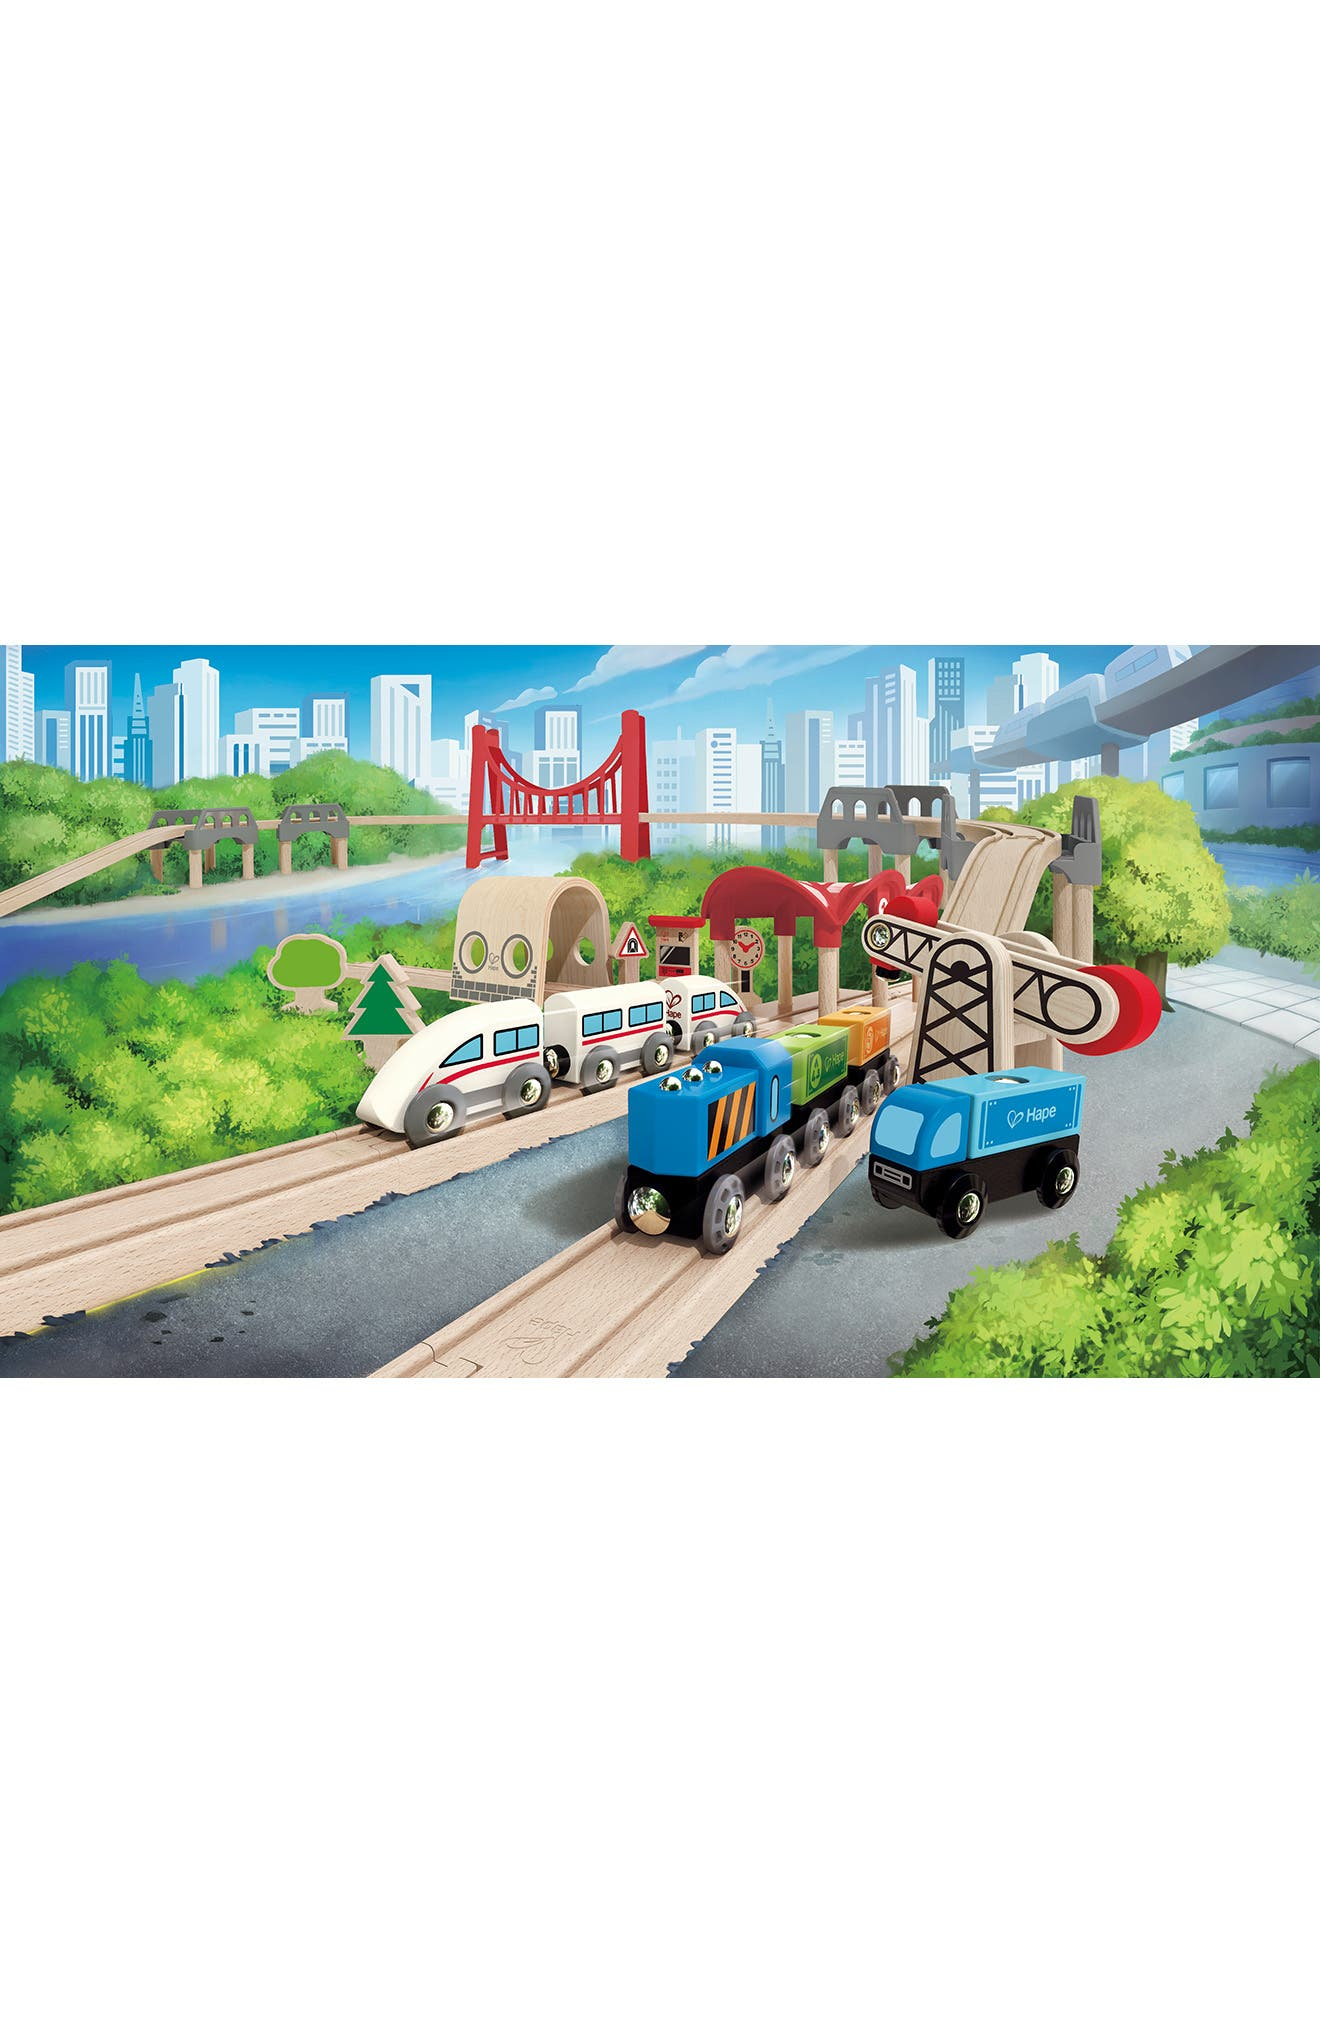 Double Loop Railway Wooden Train Set,                             Alternate thumbnail 6, color,                             250